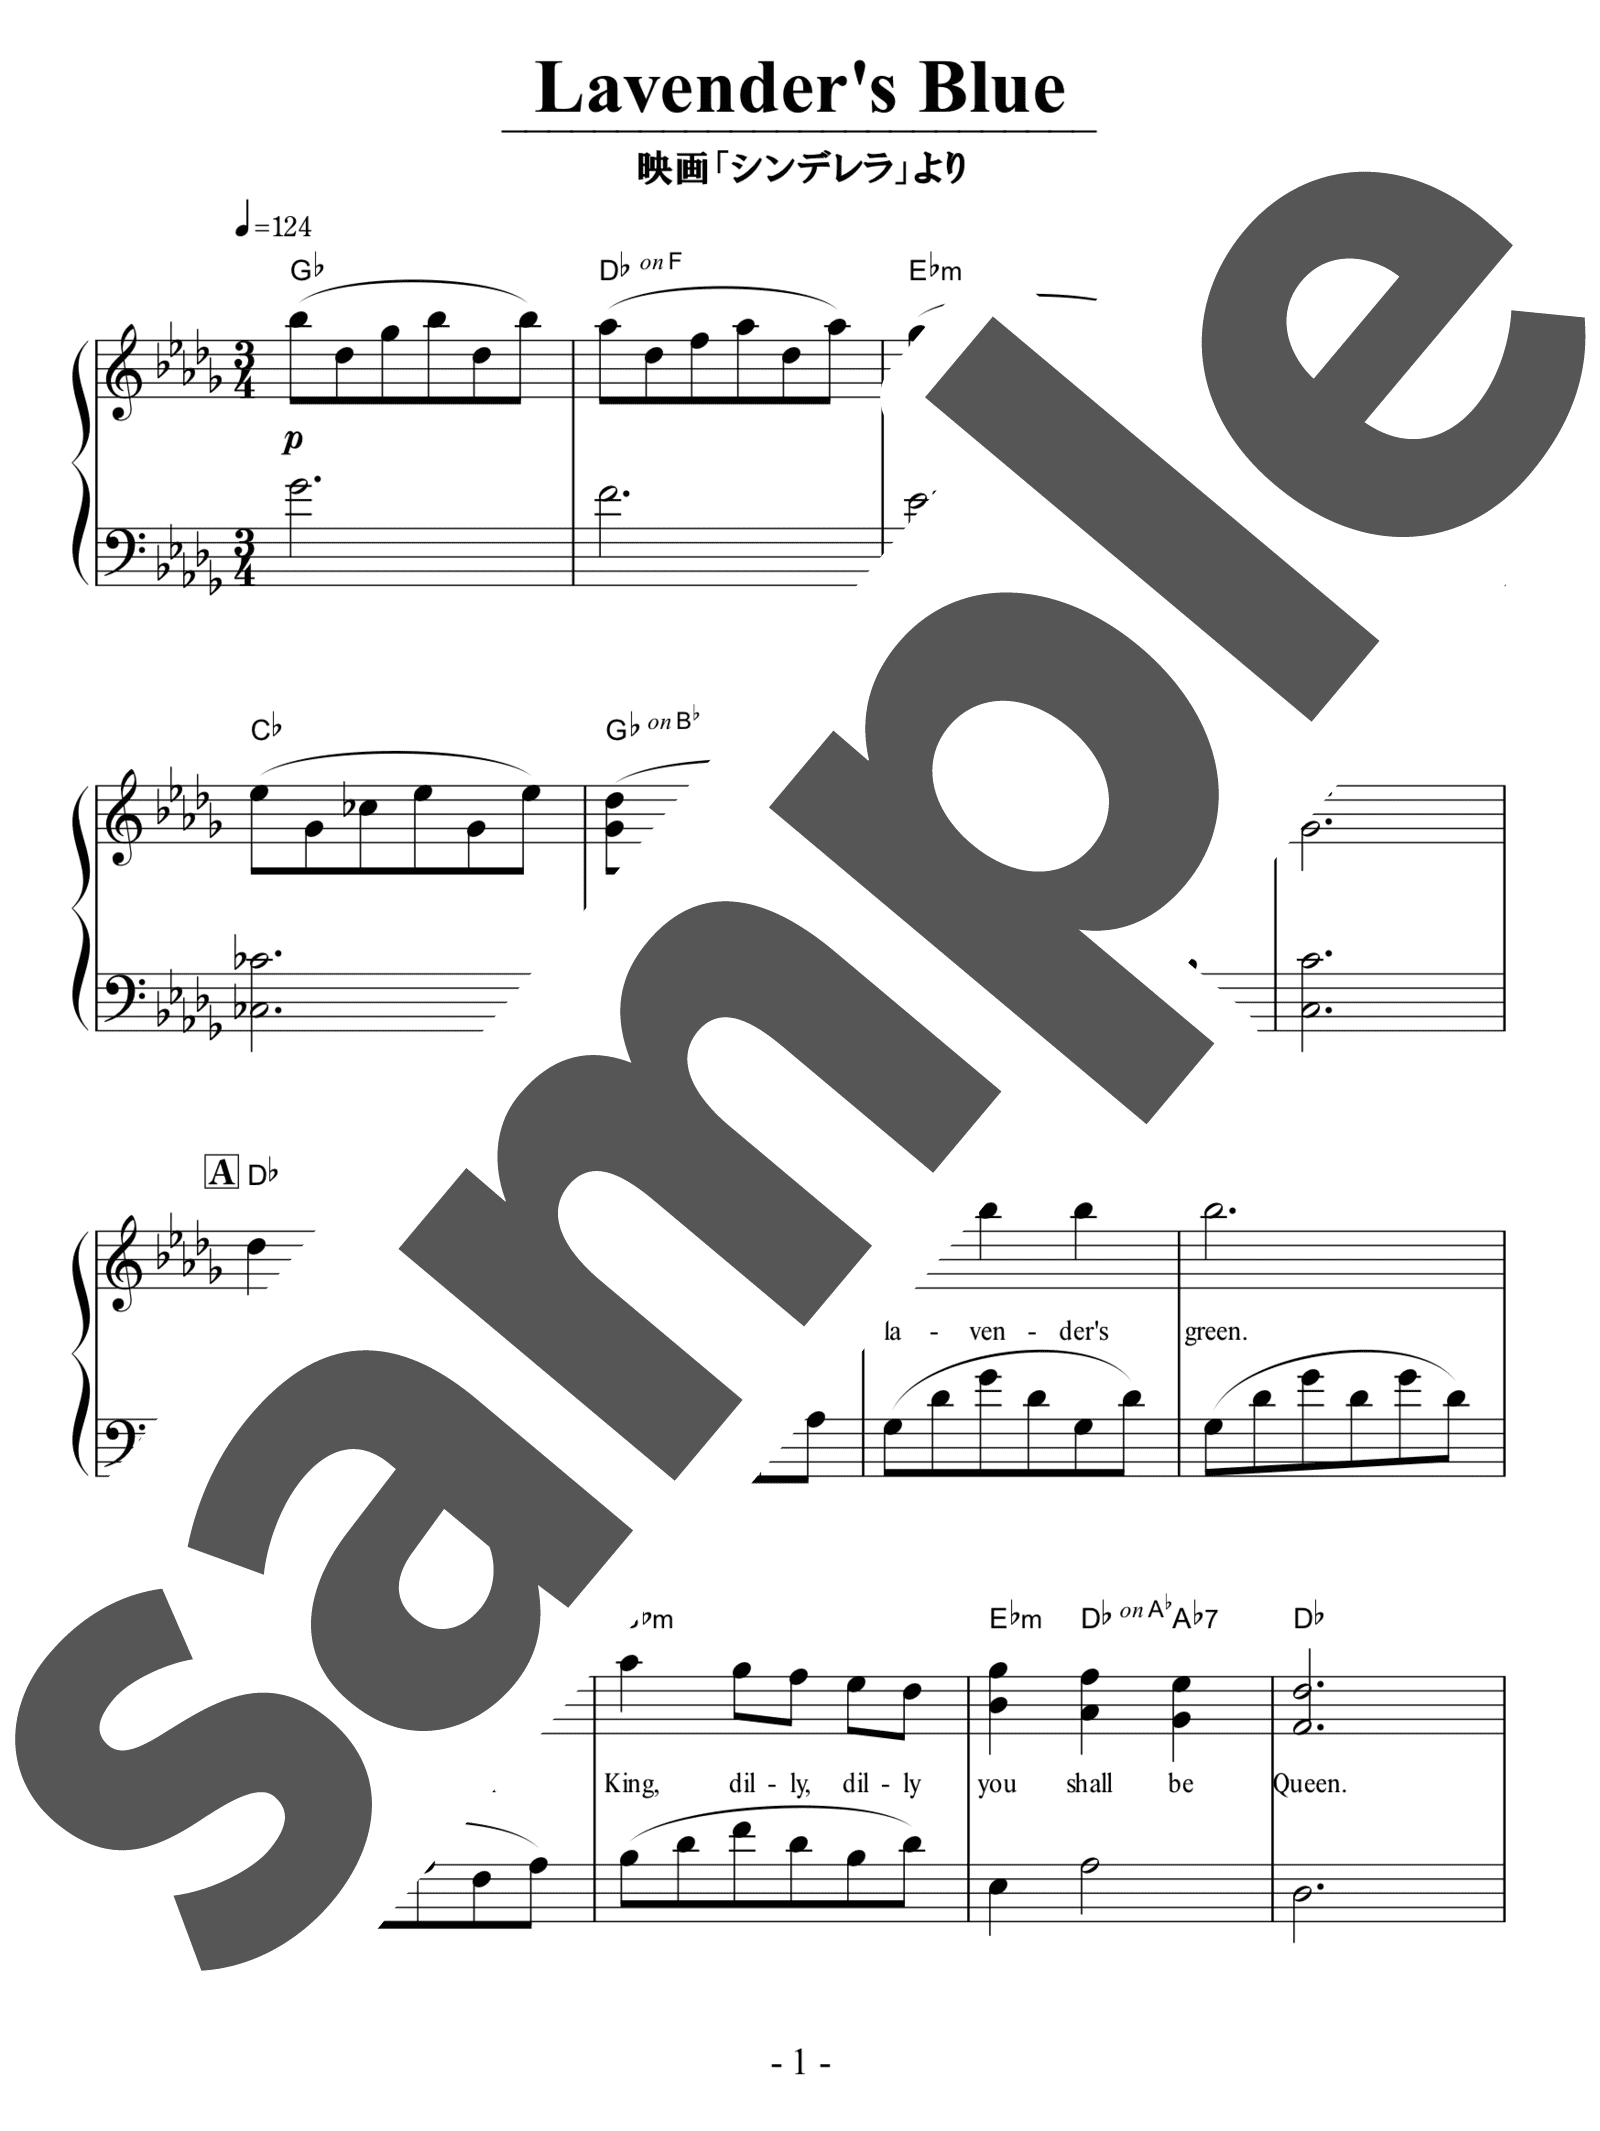 「Lavender's Blue」のサンプル楽譜